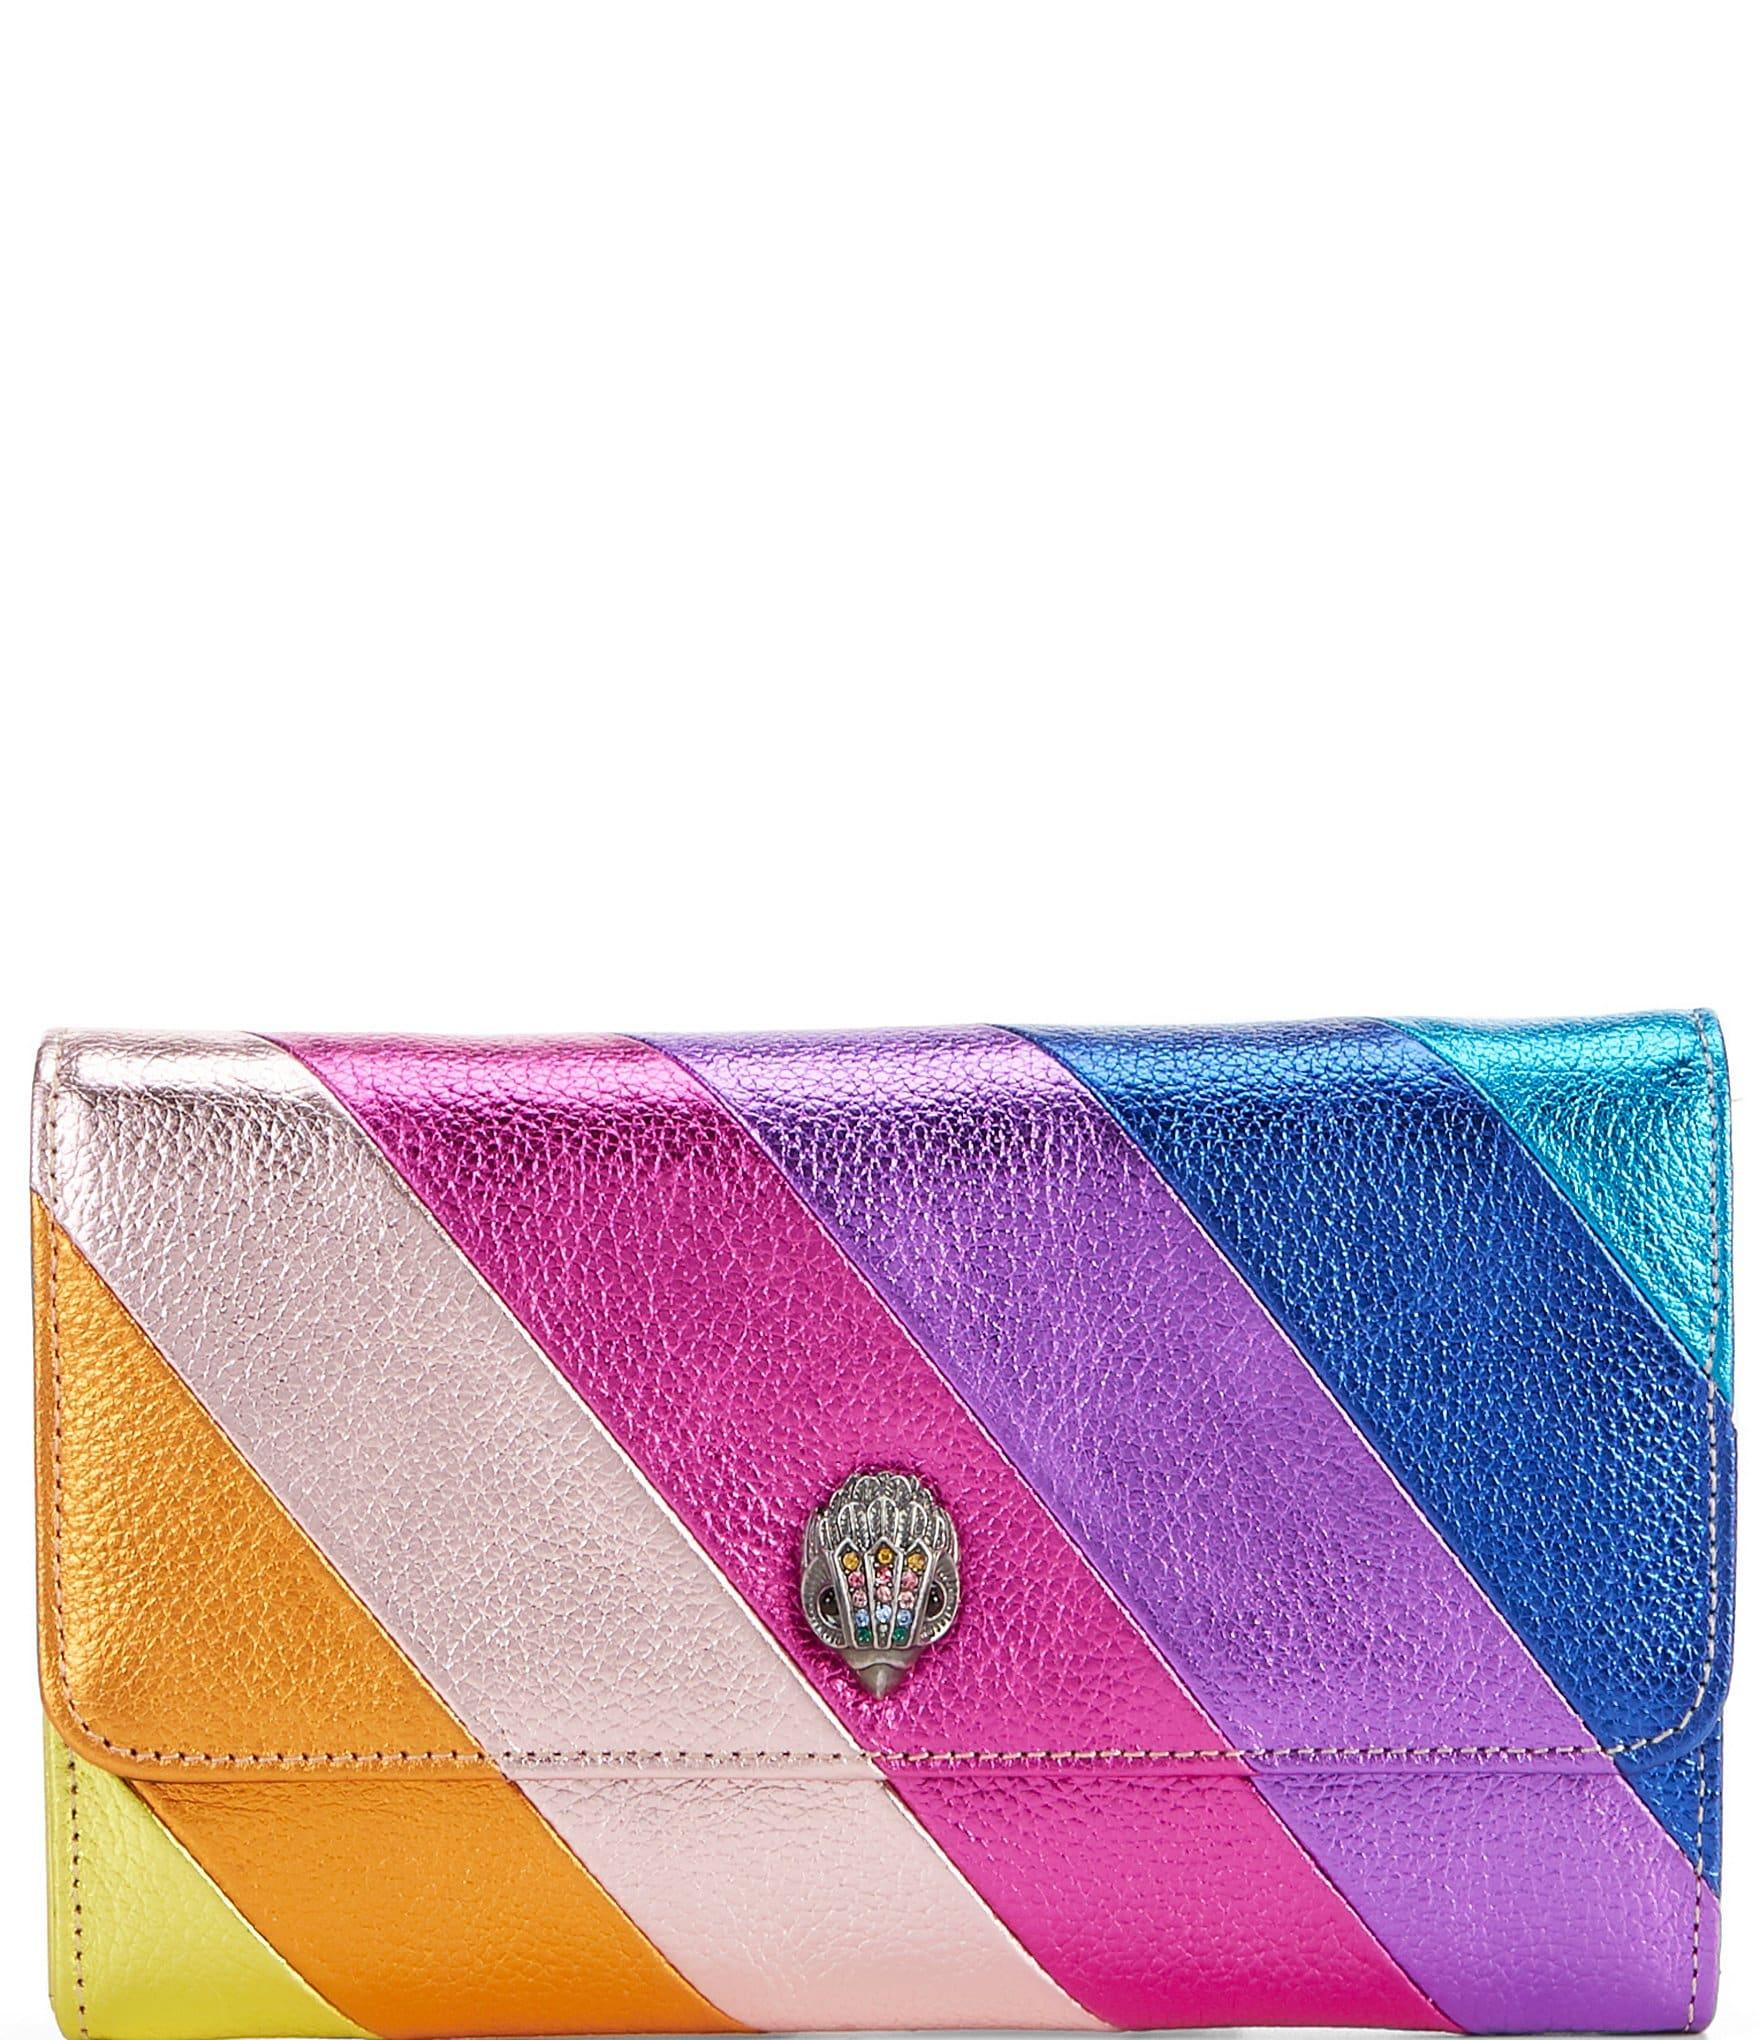 Naladoo Women Evening Envelope Handbag Party Bridal Clutch Purse Shoulder Cross Body Bag